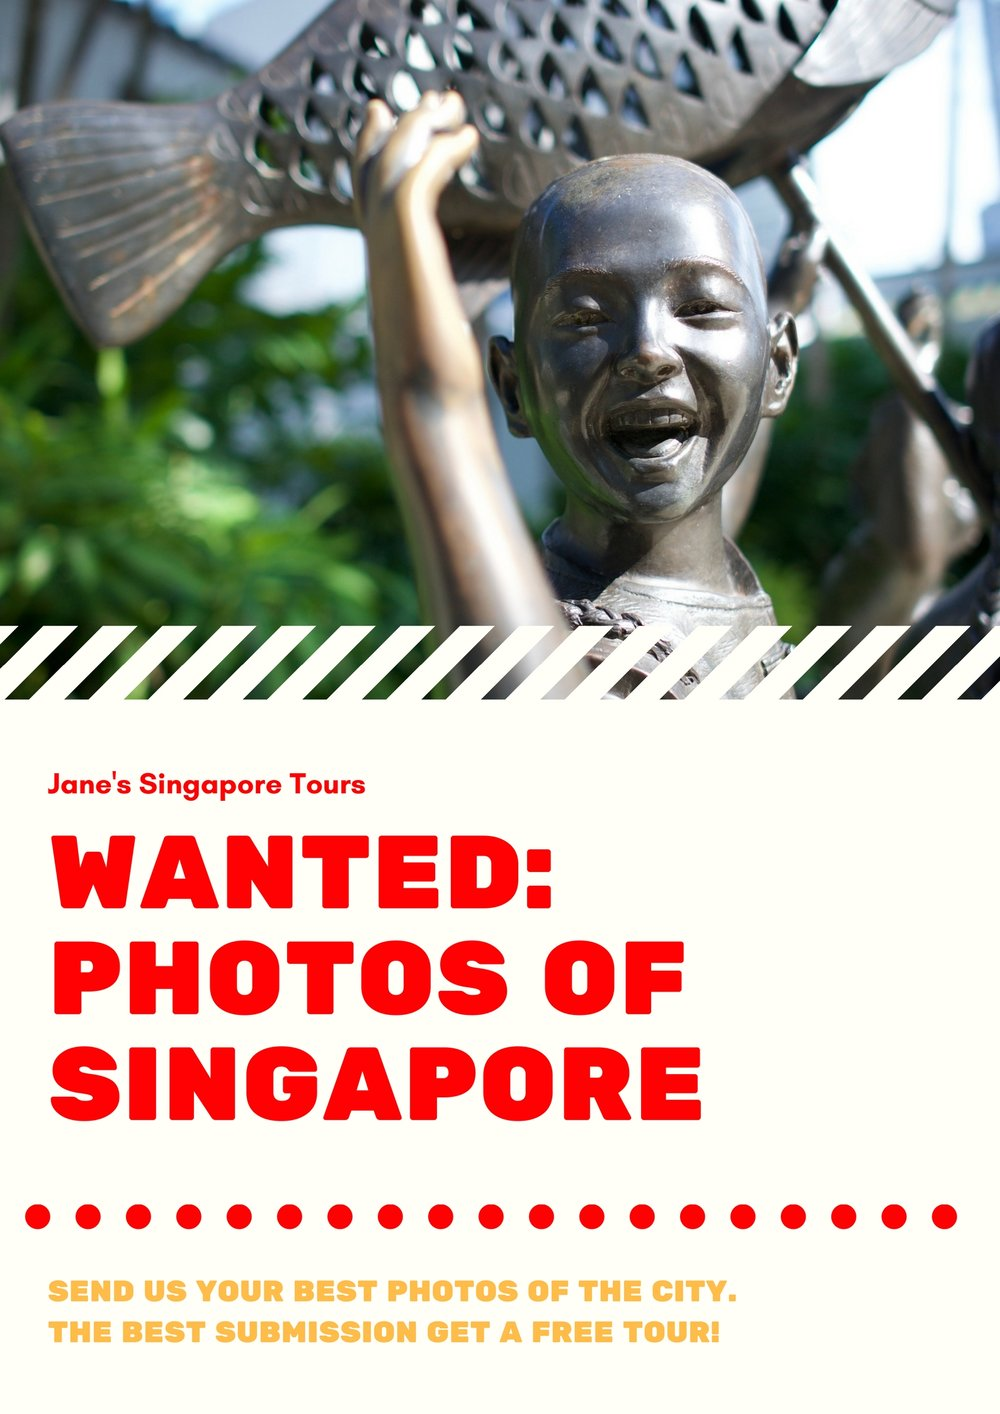 Wanted Photos of Singapore